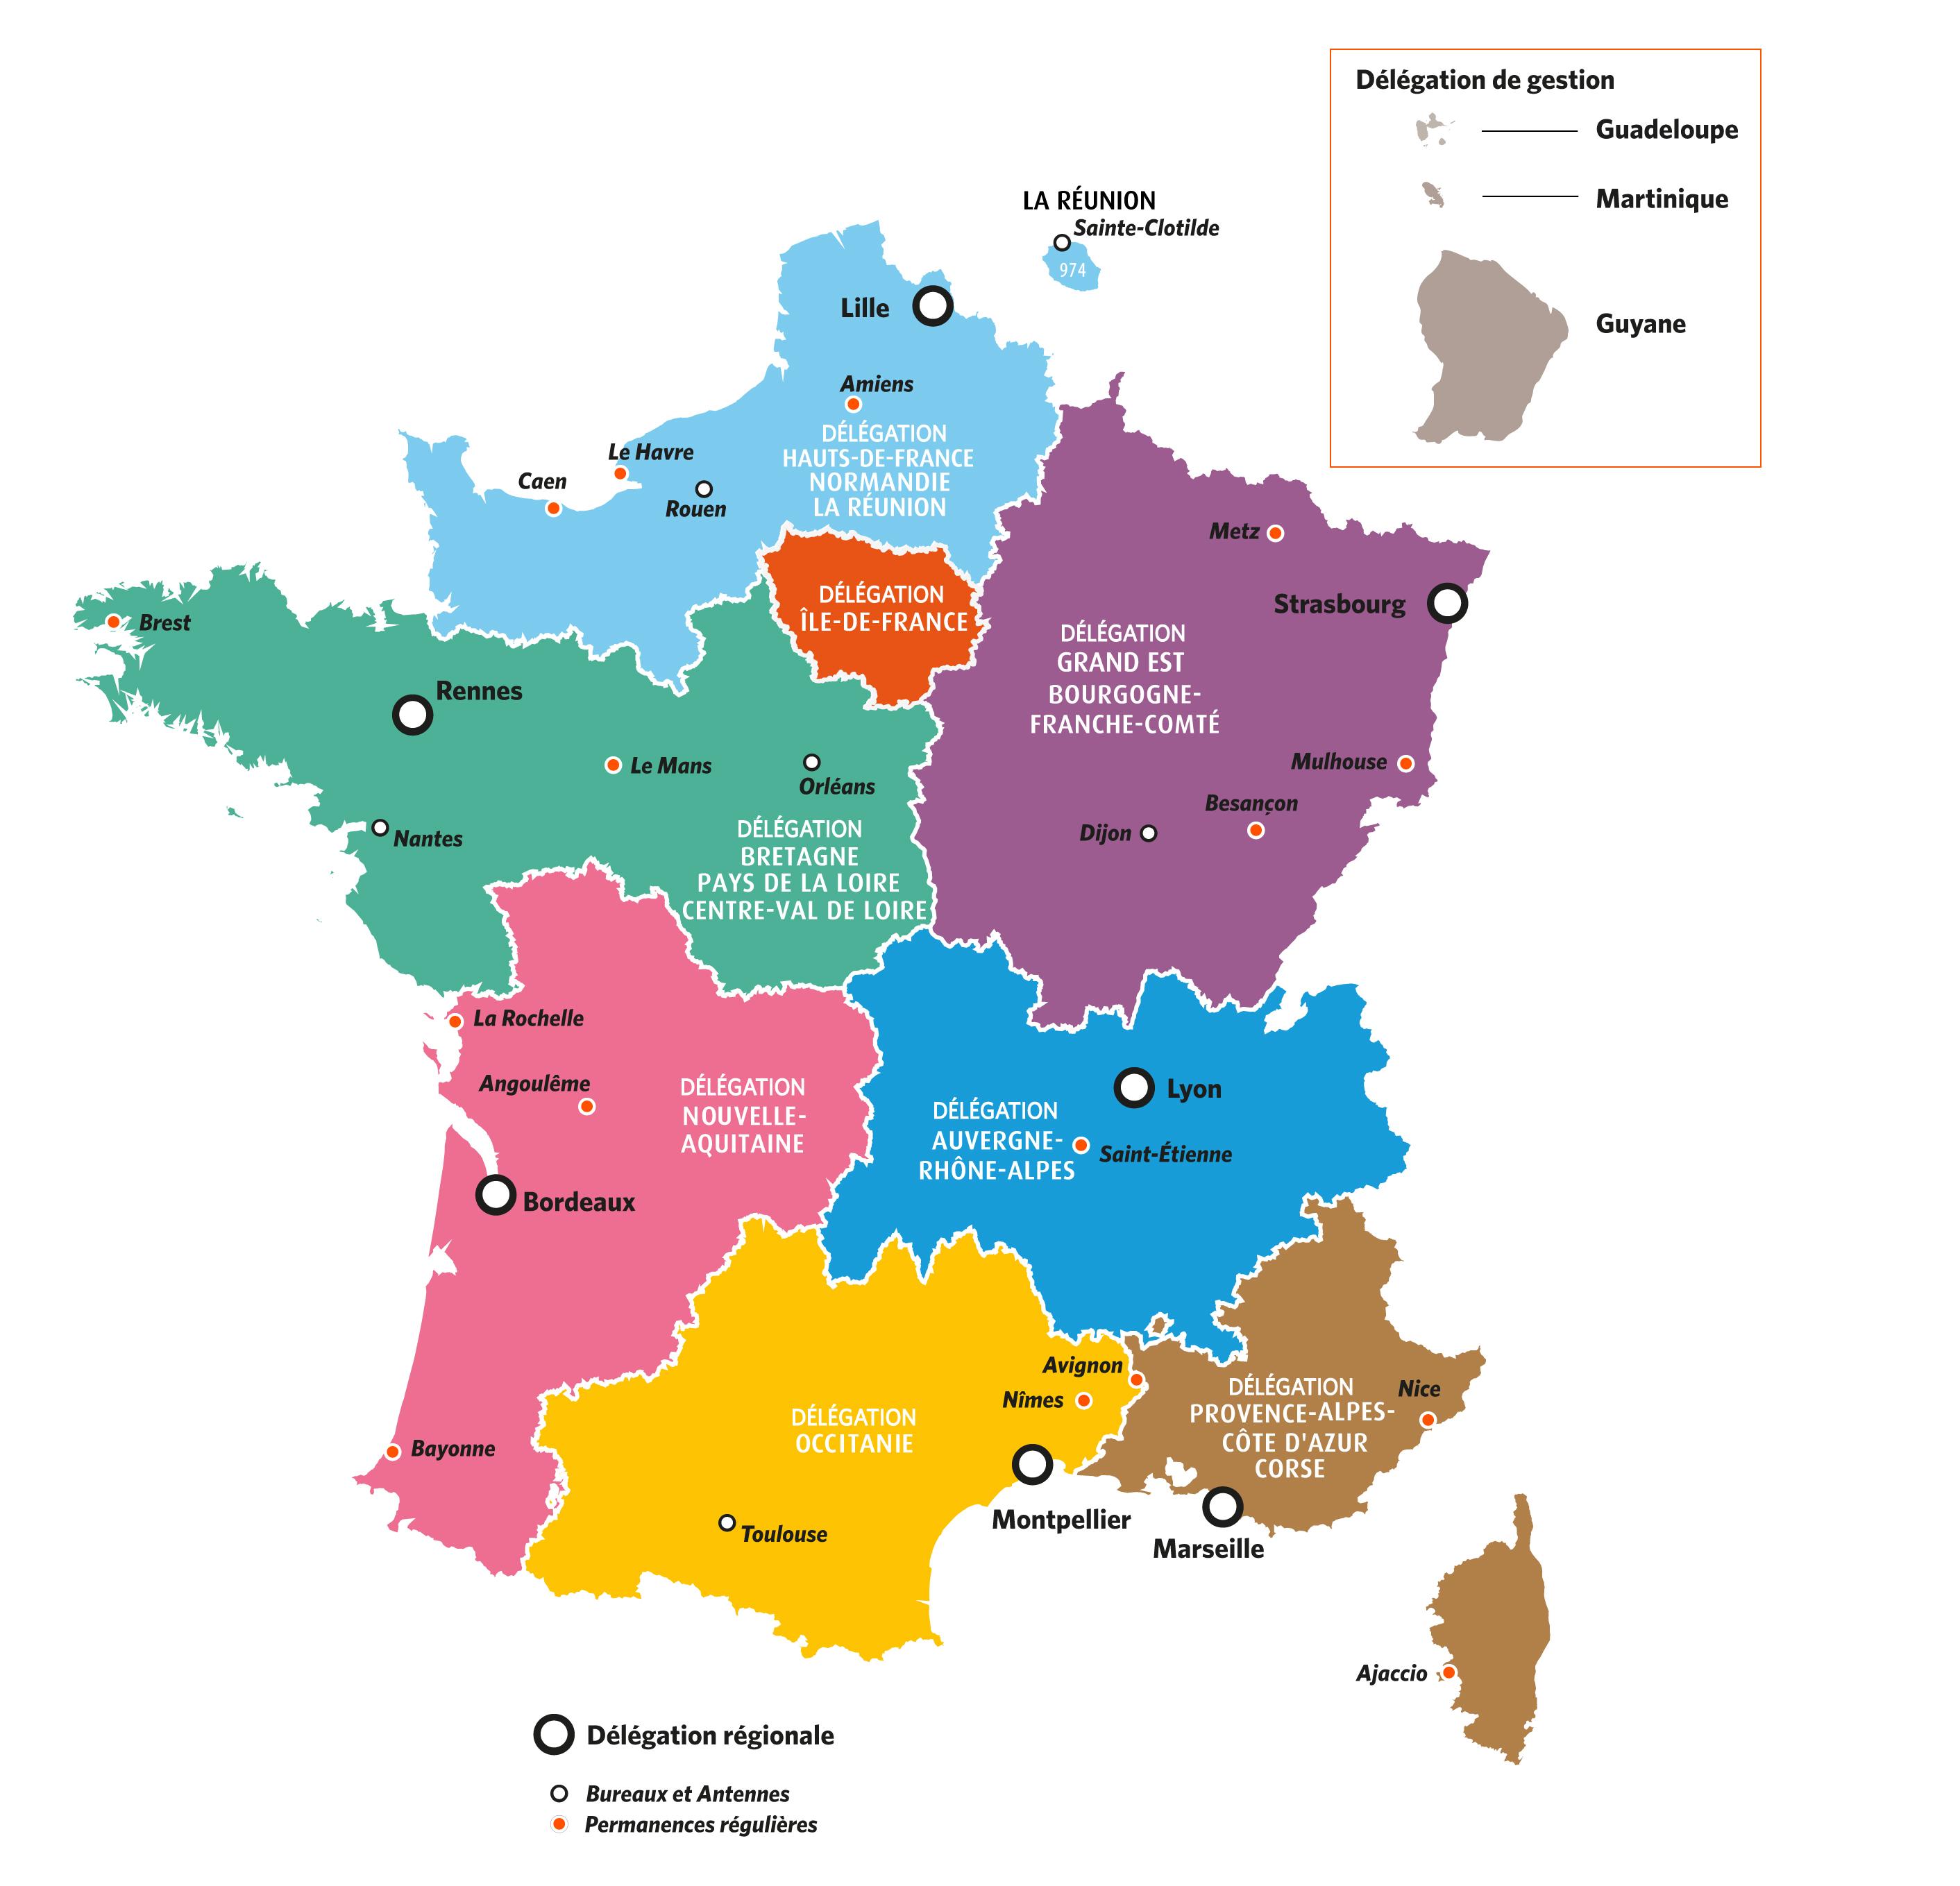 avignon carte de france File:CARTE DE FRANCE AFDAS.   Wikimedia Commons